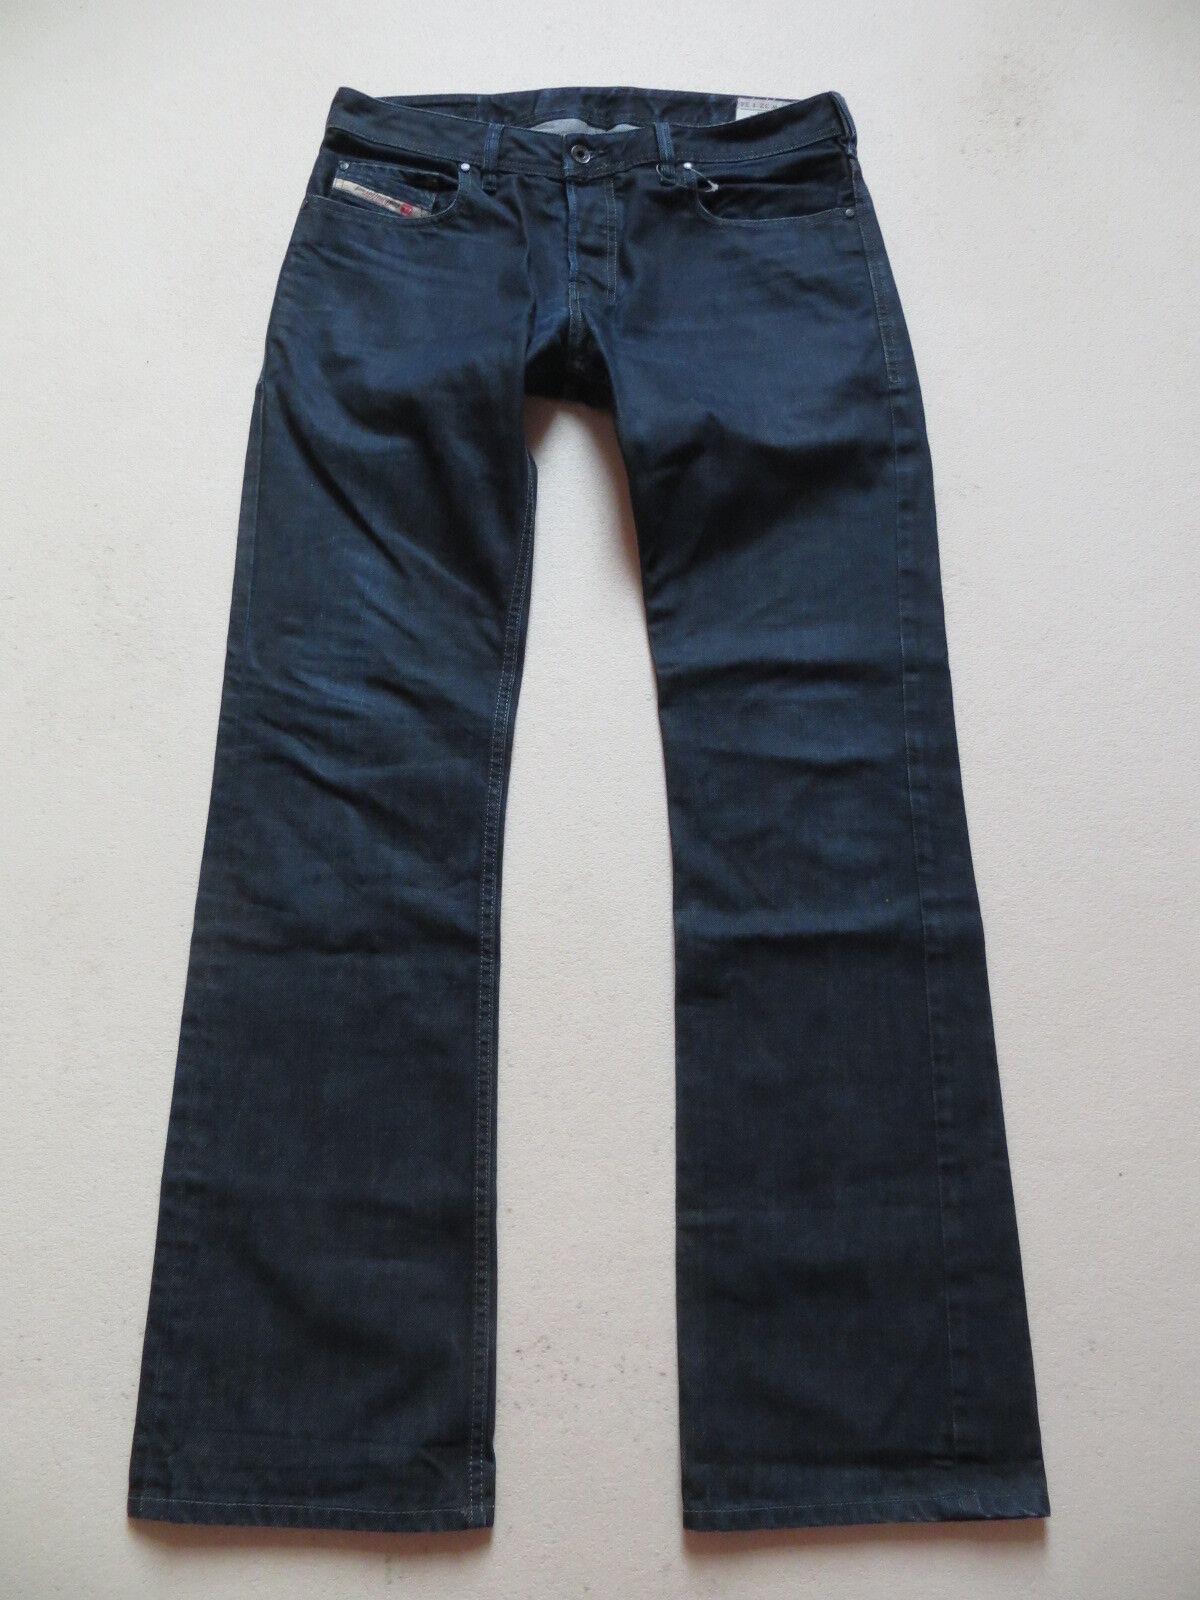 Diesel ZATINY wash 0088Z Stiefelcut Jeans Hose W 32  L 34 dark Indigo Denim TOP